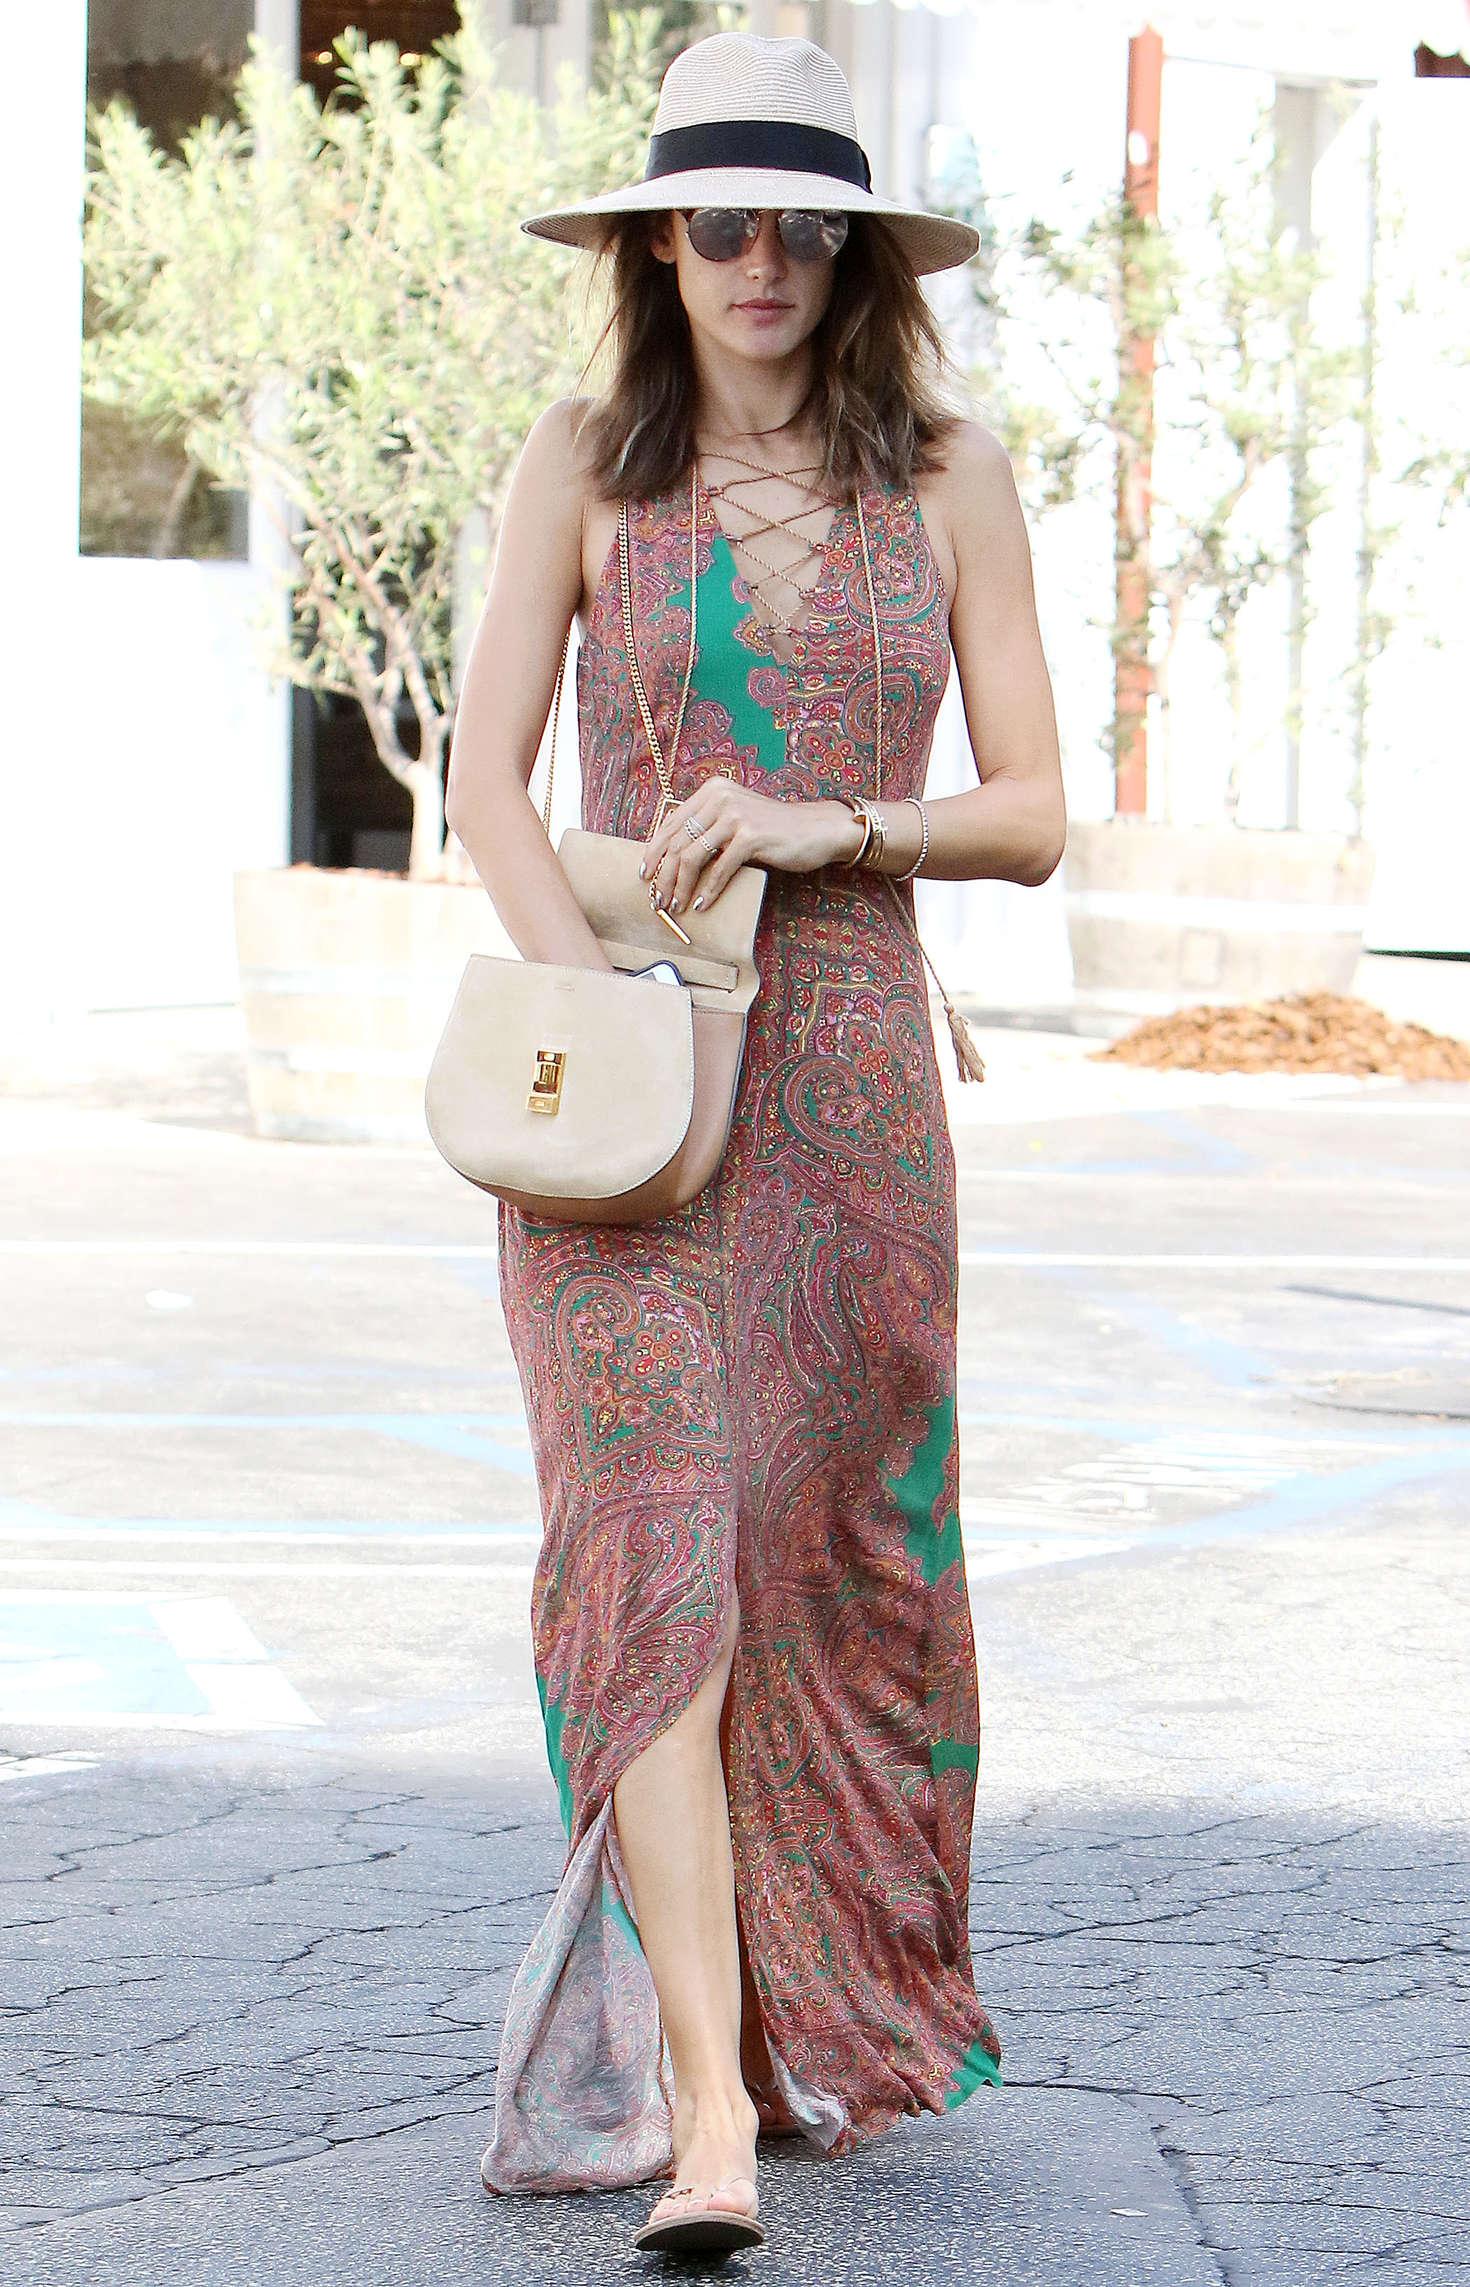 Alessandra Ambrosio 2016 : Alessandra Ambrosio in Long Summer Dress -20